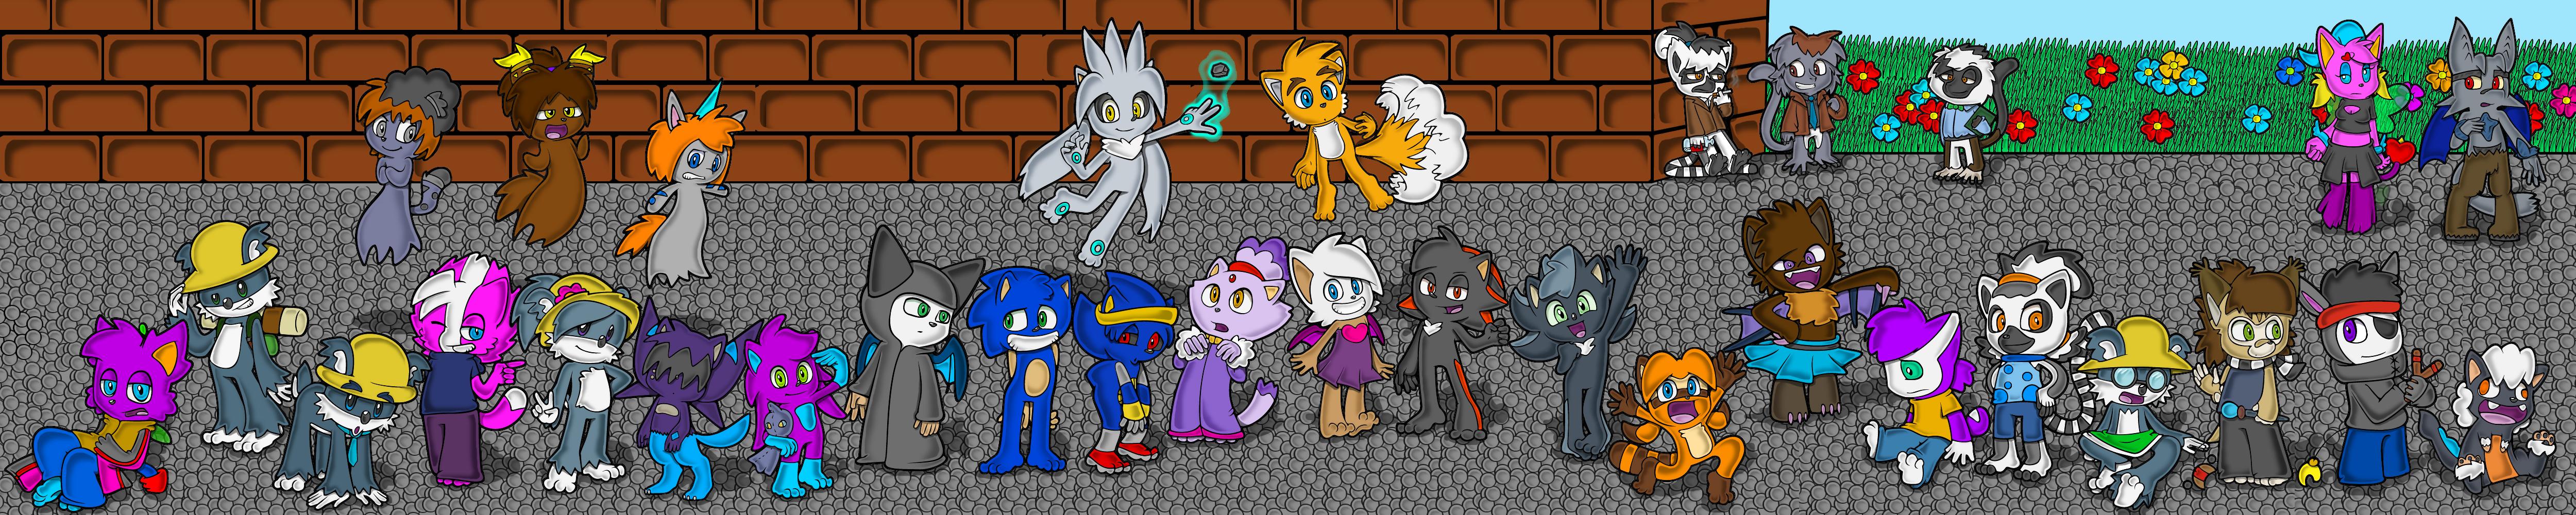 Sonic kids by Animatics